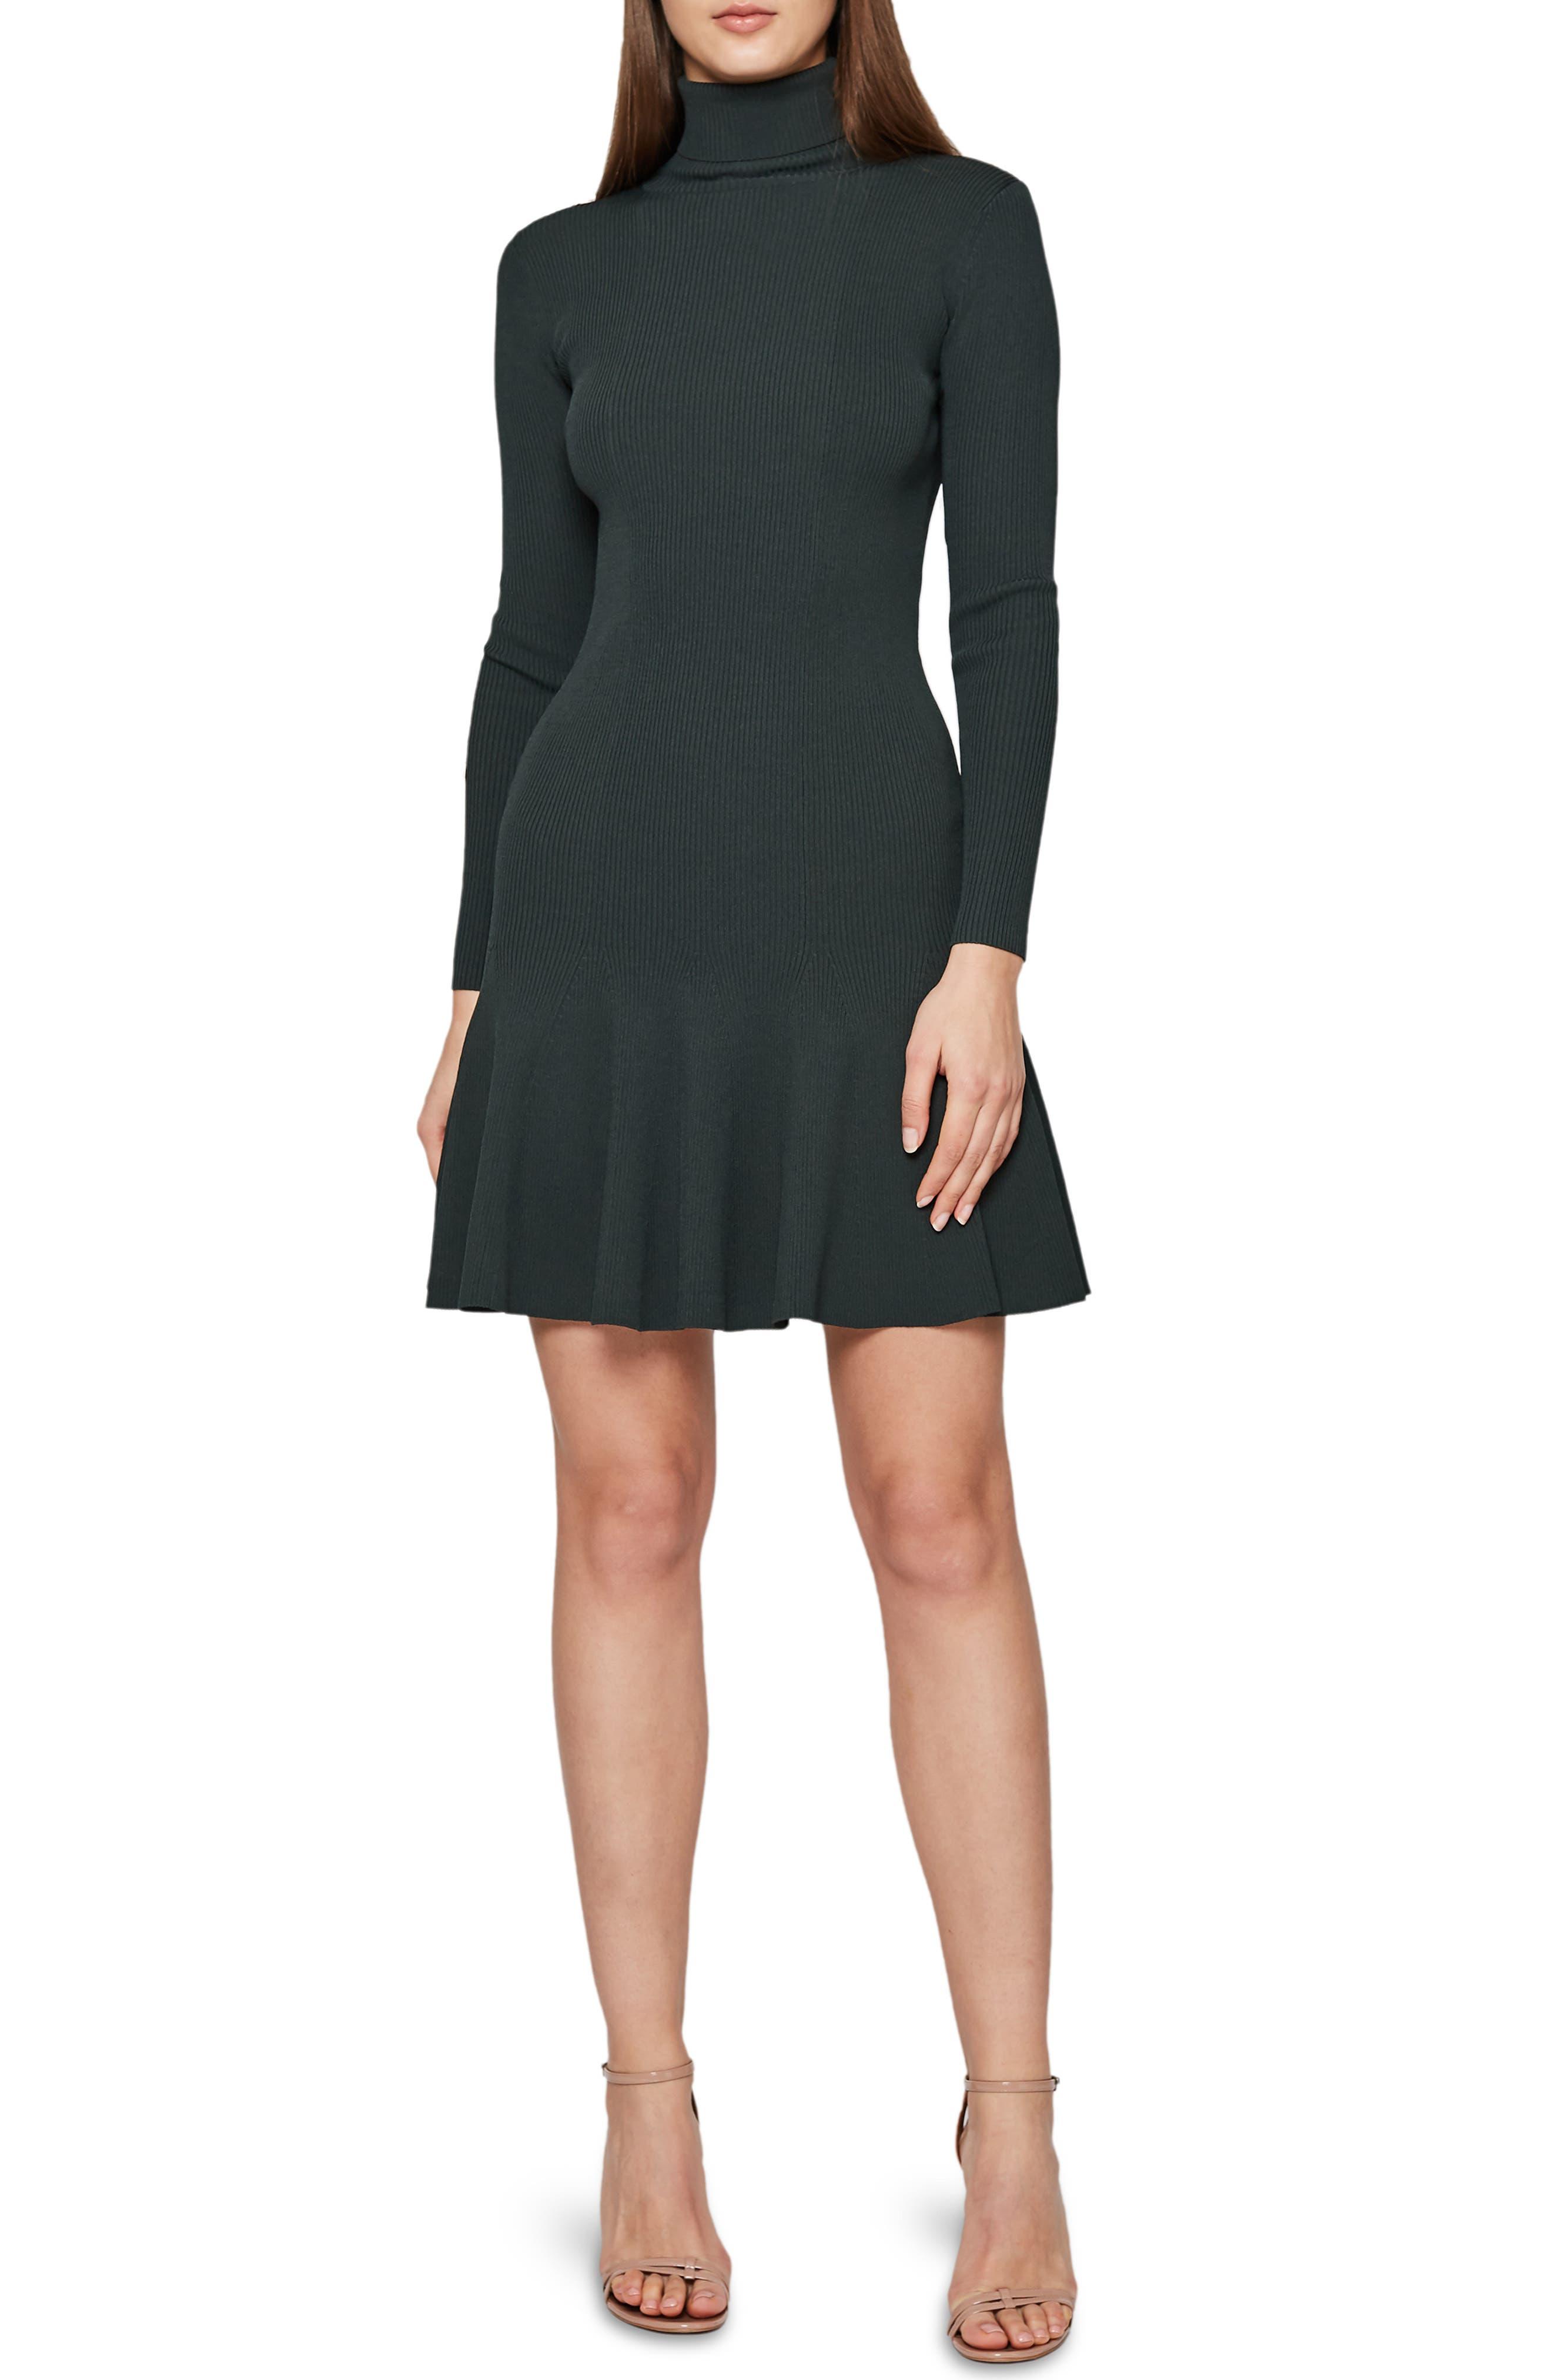 REISS Mimi Turtleneck Sweater Dress, Main, color, GREEN